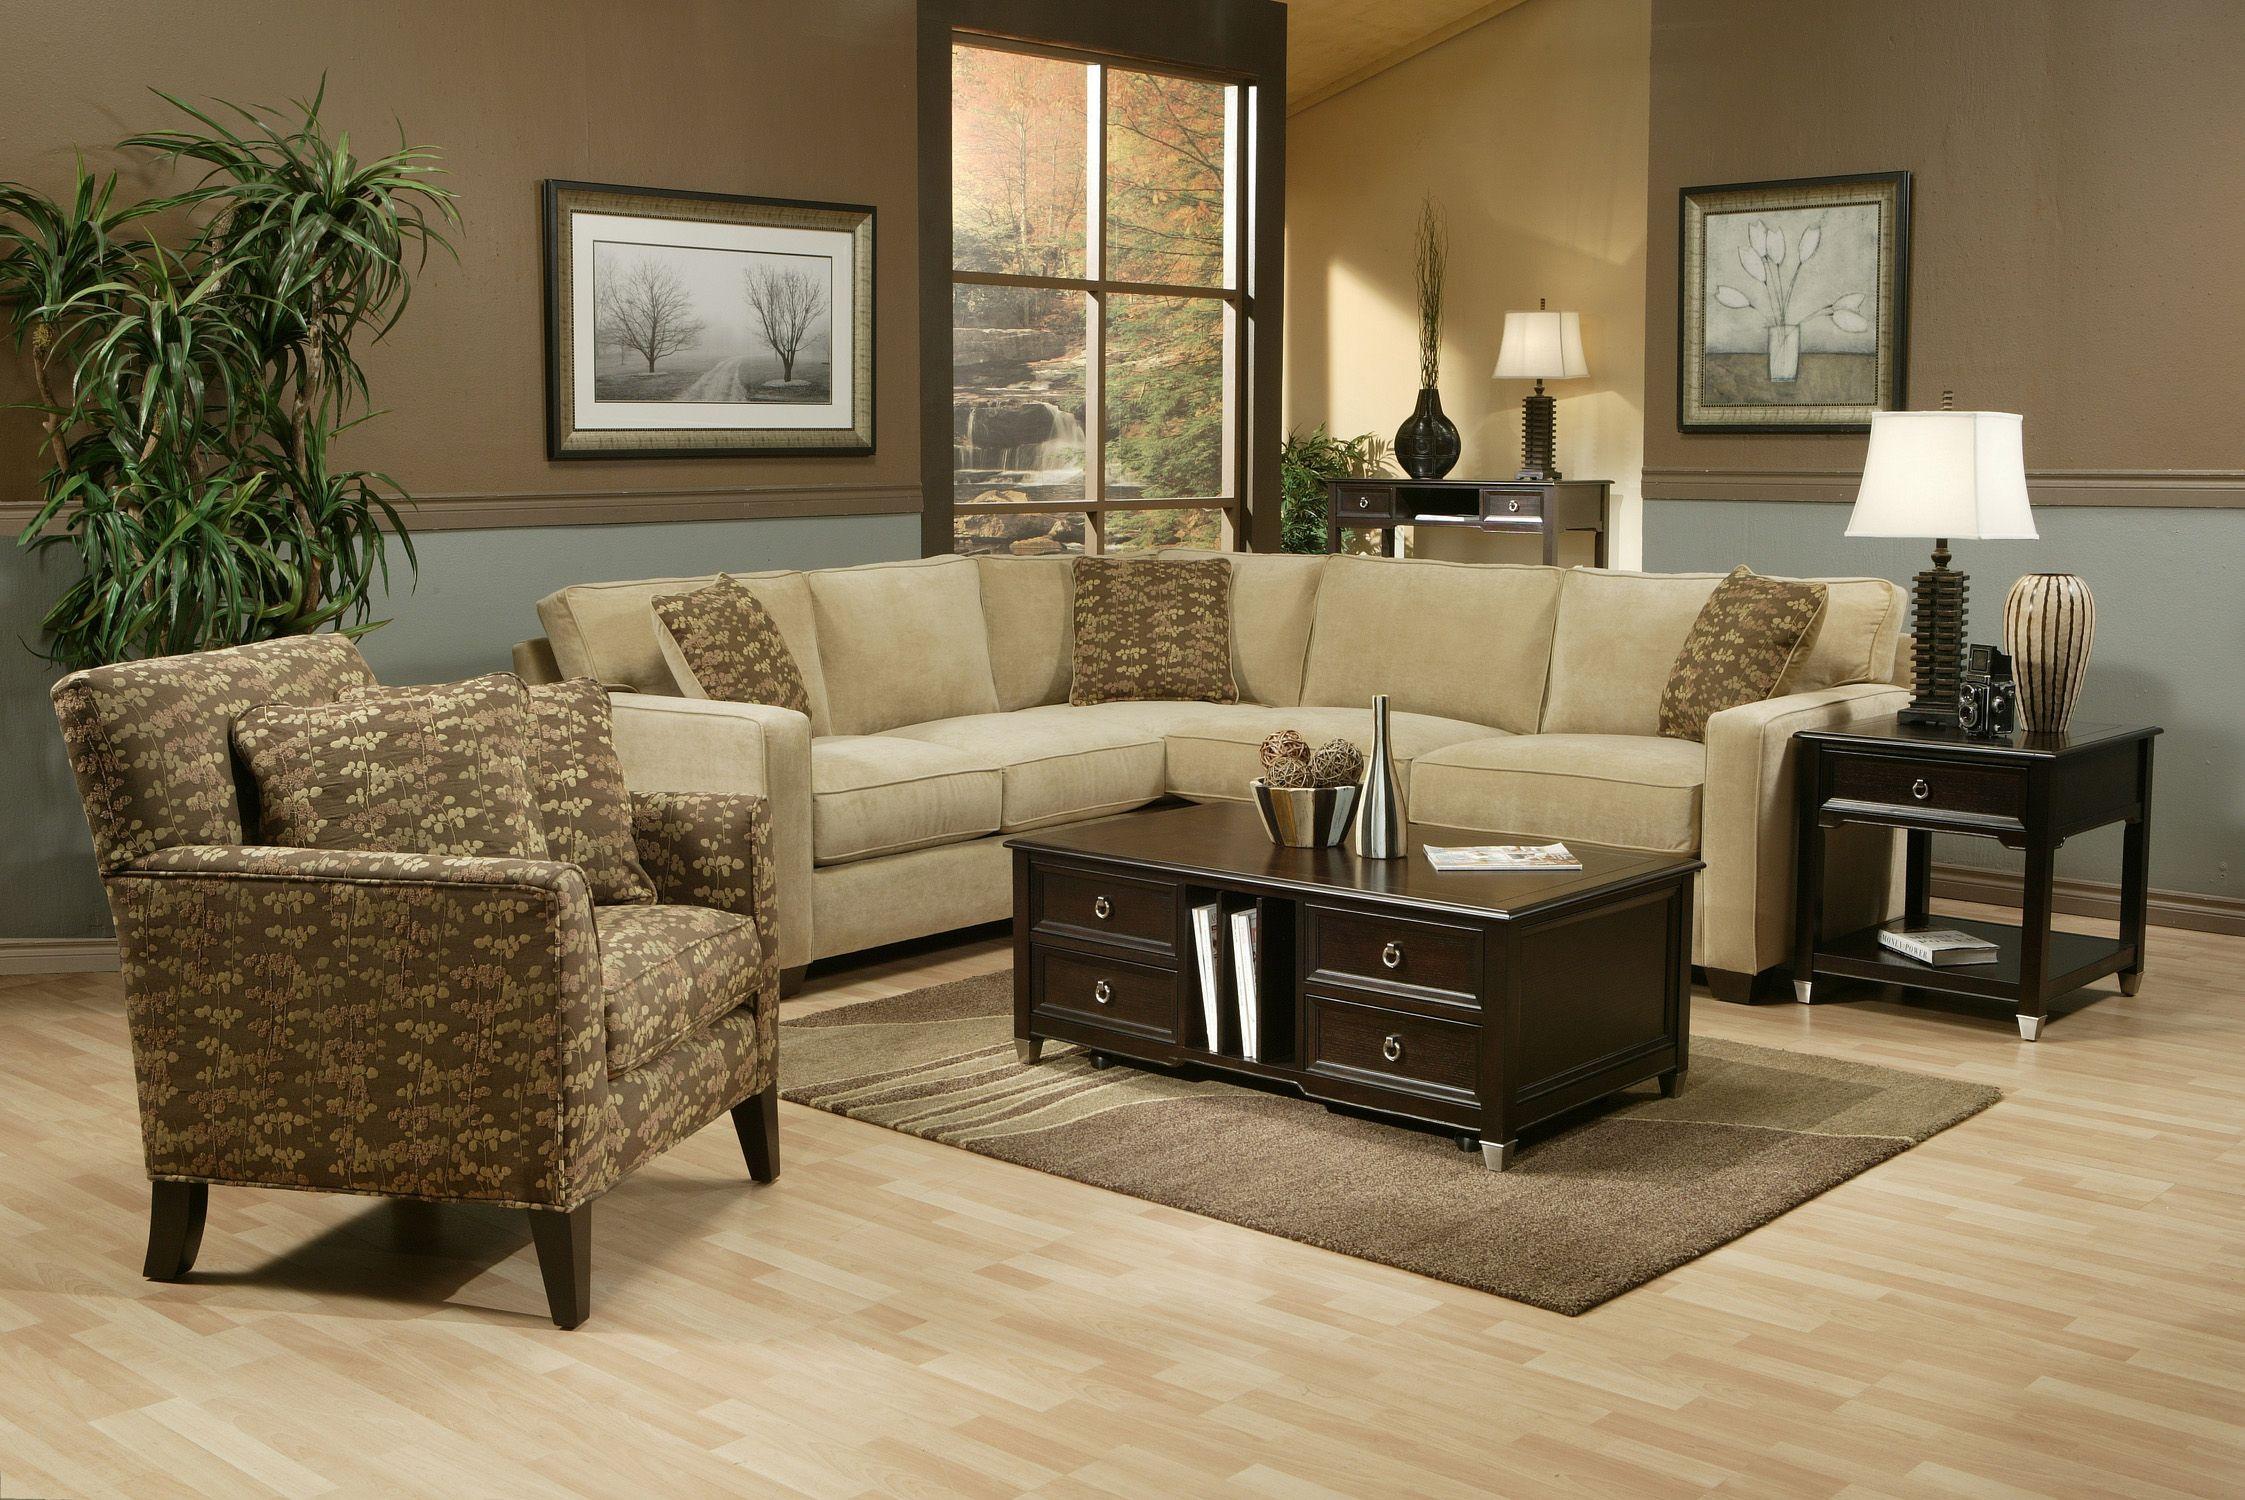 Bradford Sofa loveseat chair & ottoman Multiple Sectional